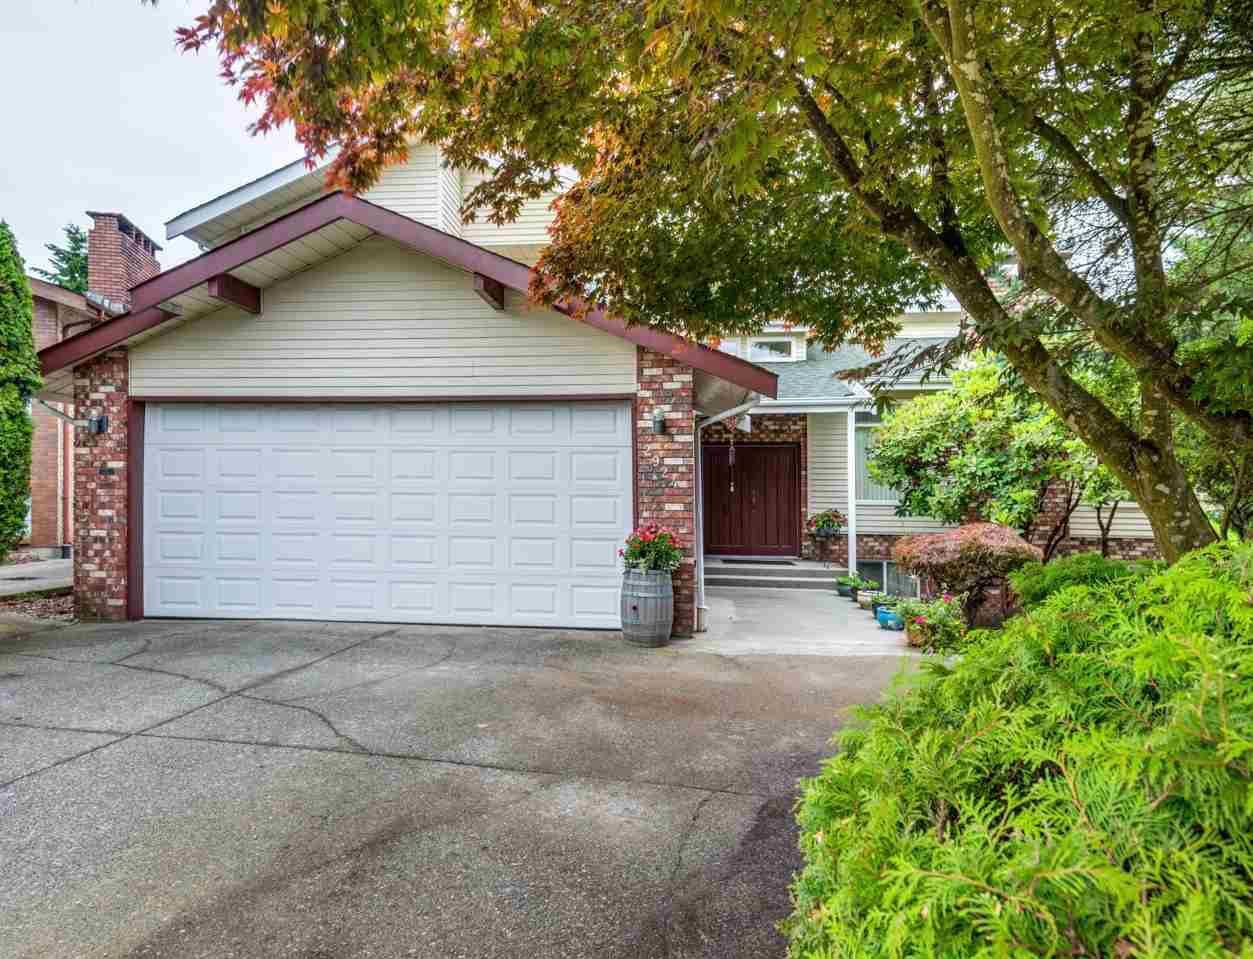 Main Photo: 2924 ROSEGLEN Court in Burnaby: Montecito House for sale (Burnaby North)  : MLS®# R2179852